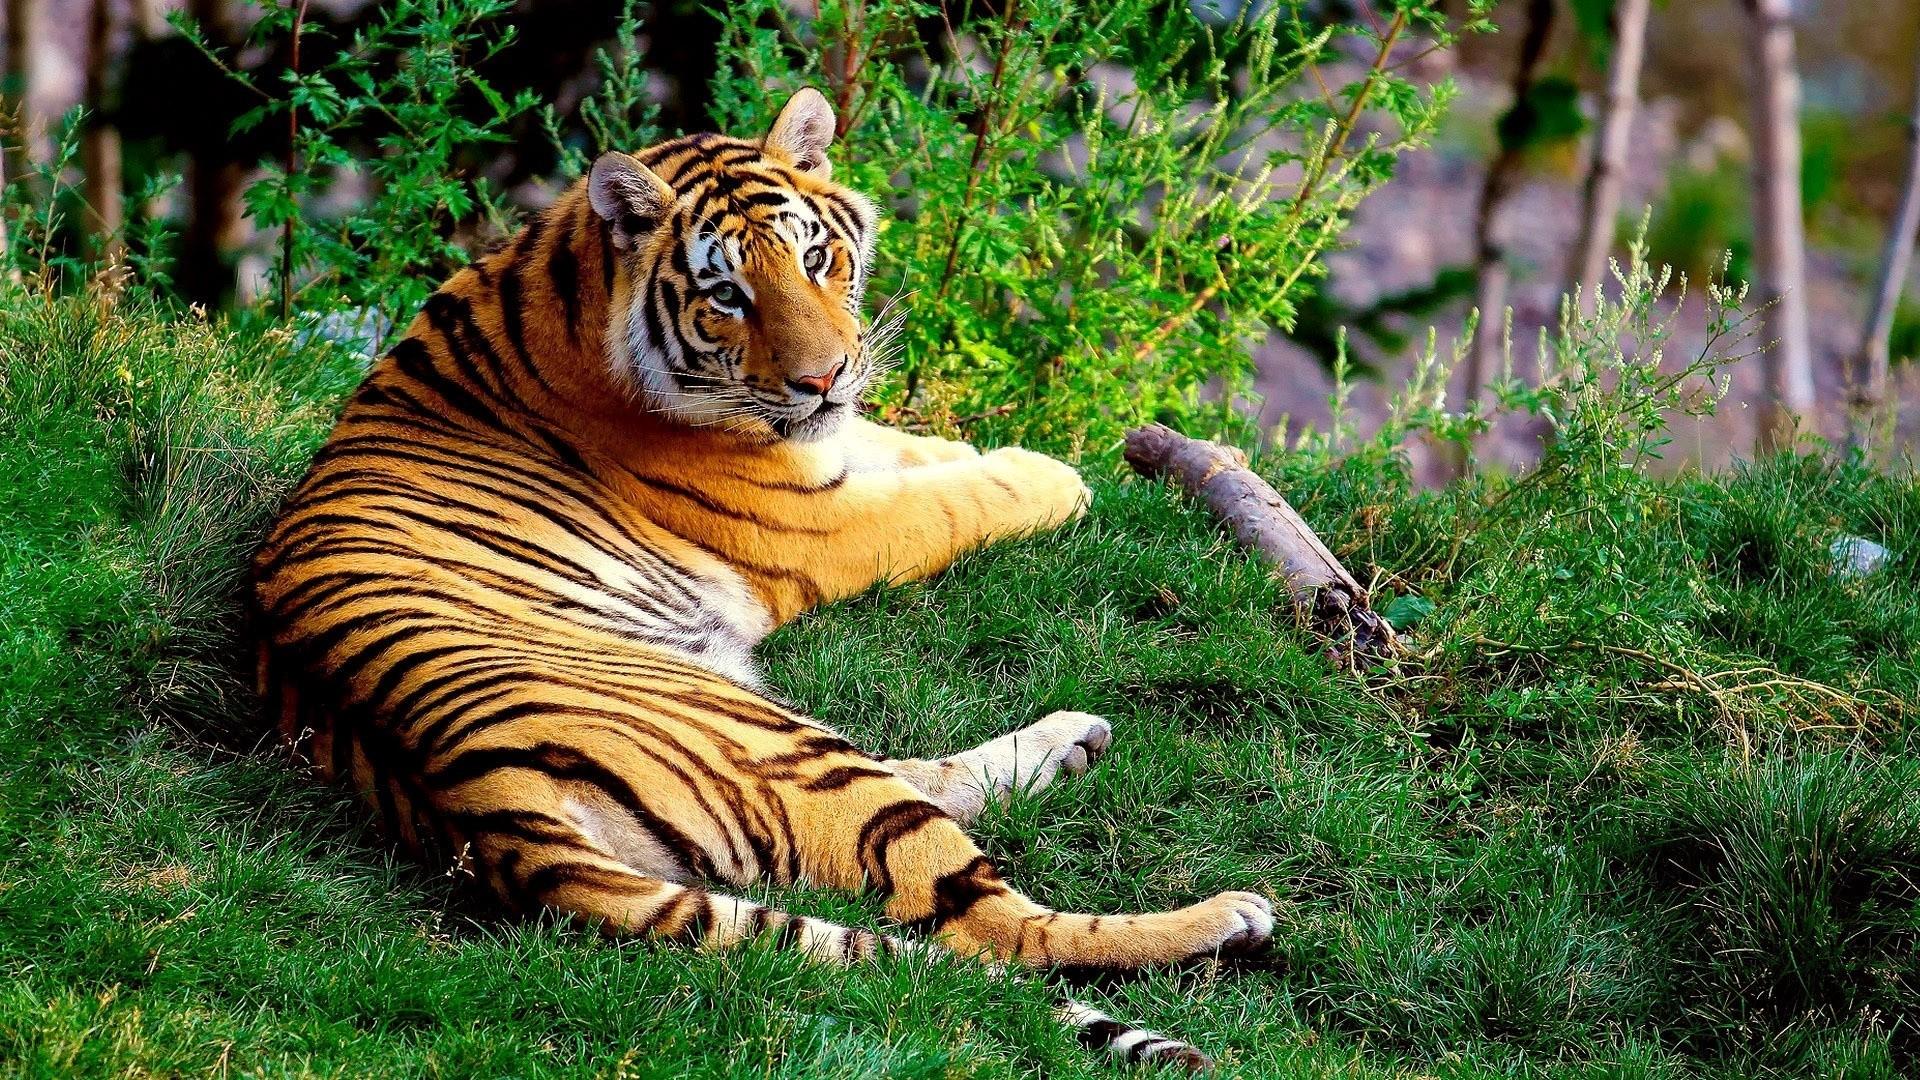 … Background Full HD 1080p. Wallpaper tiger, lying, grass,  wood, big cat